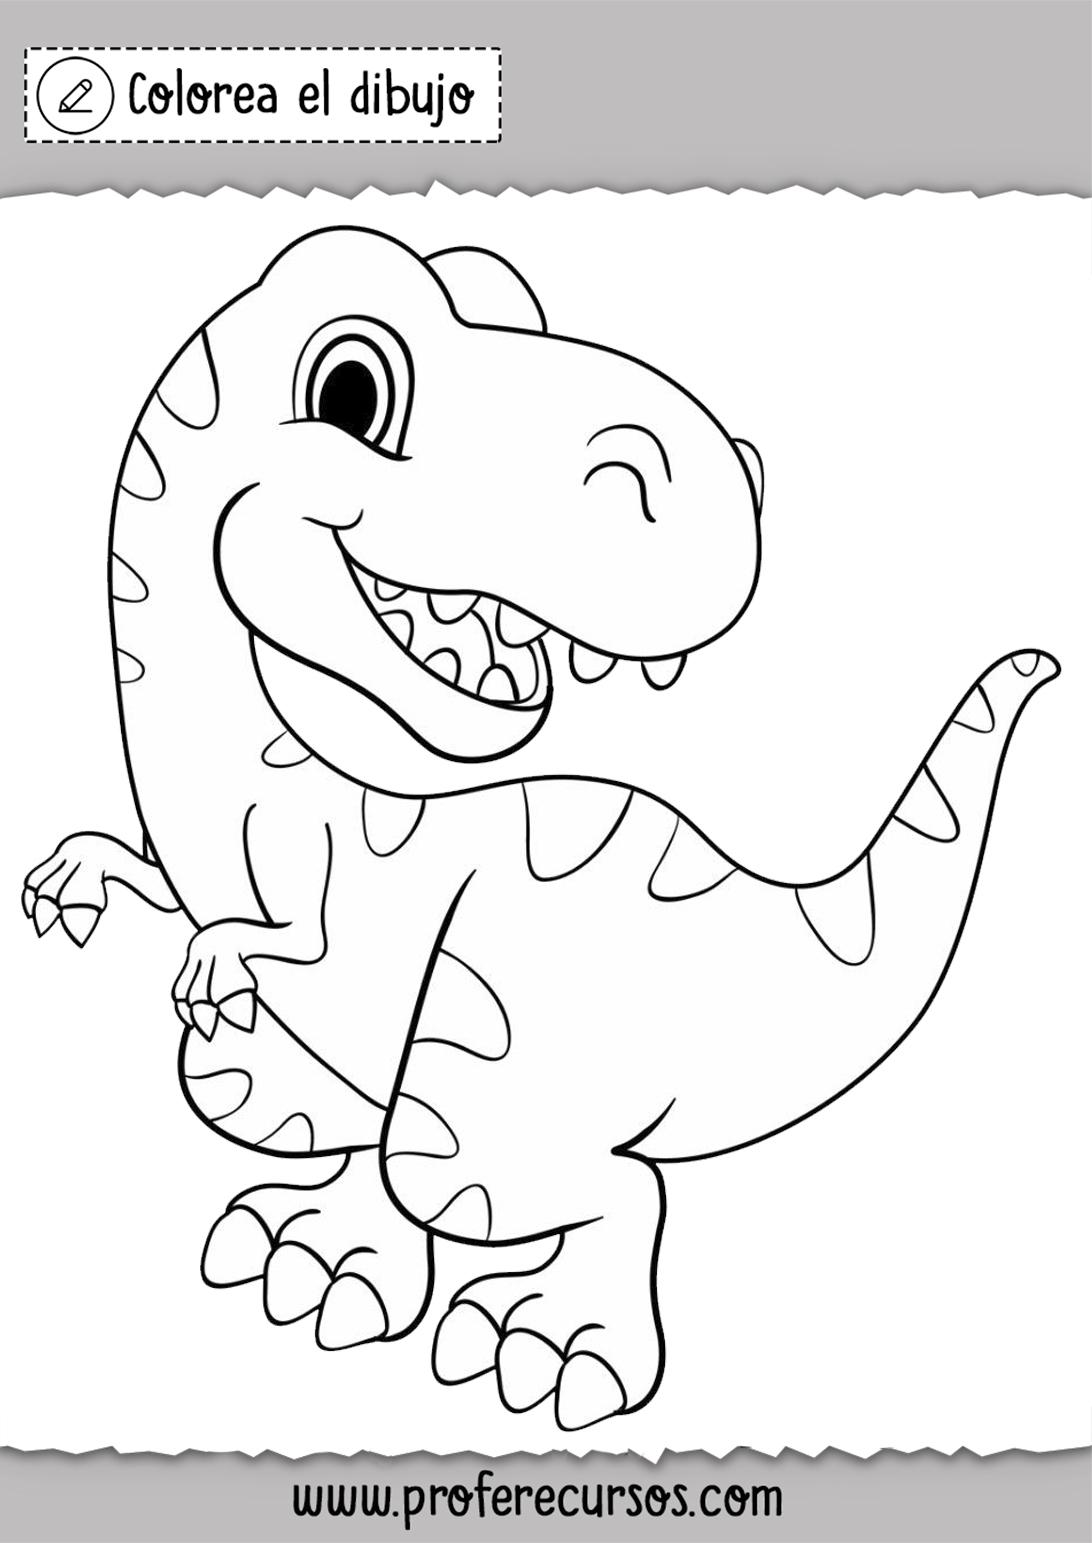 Colorear Dibujos de Dinosaurios